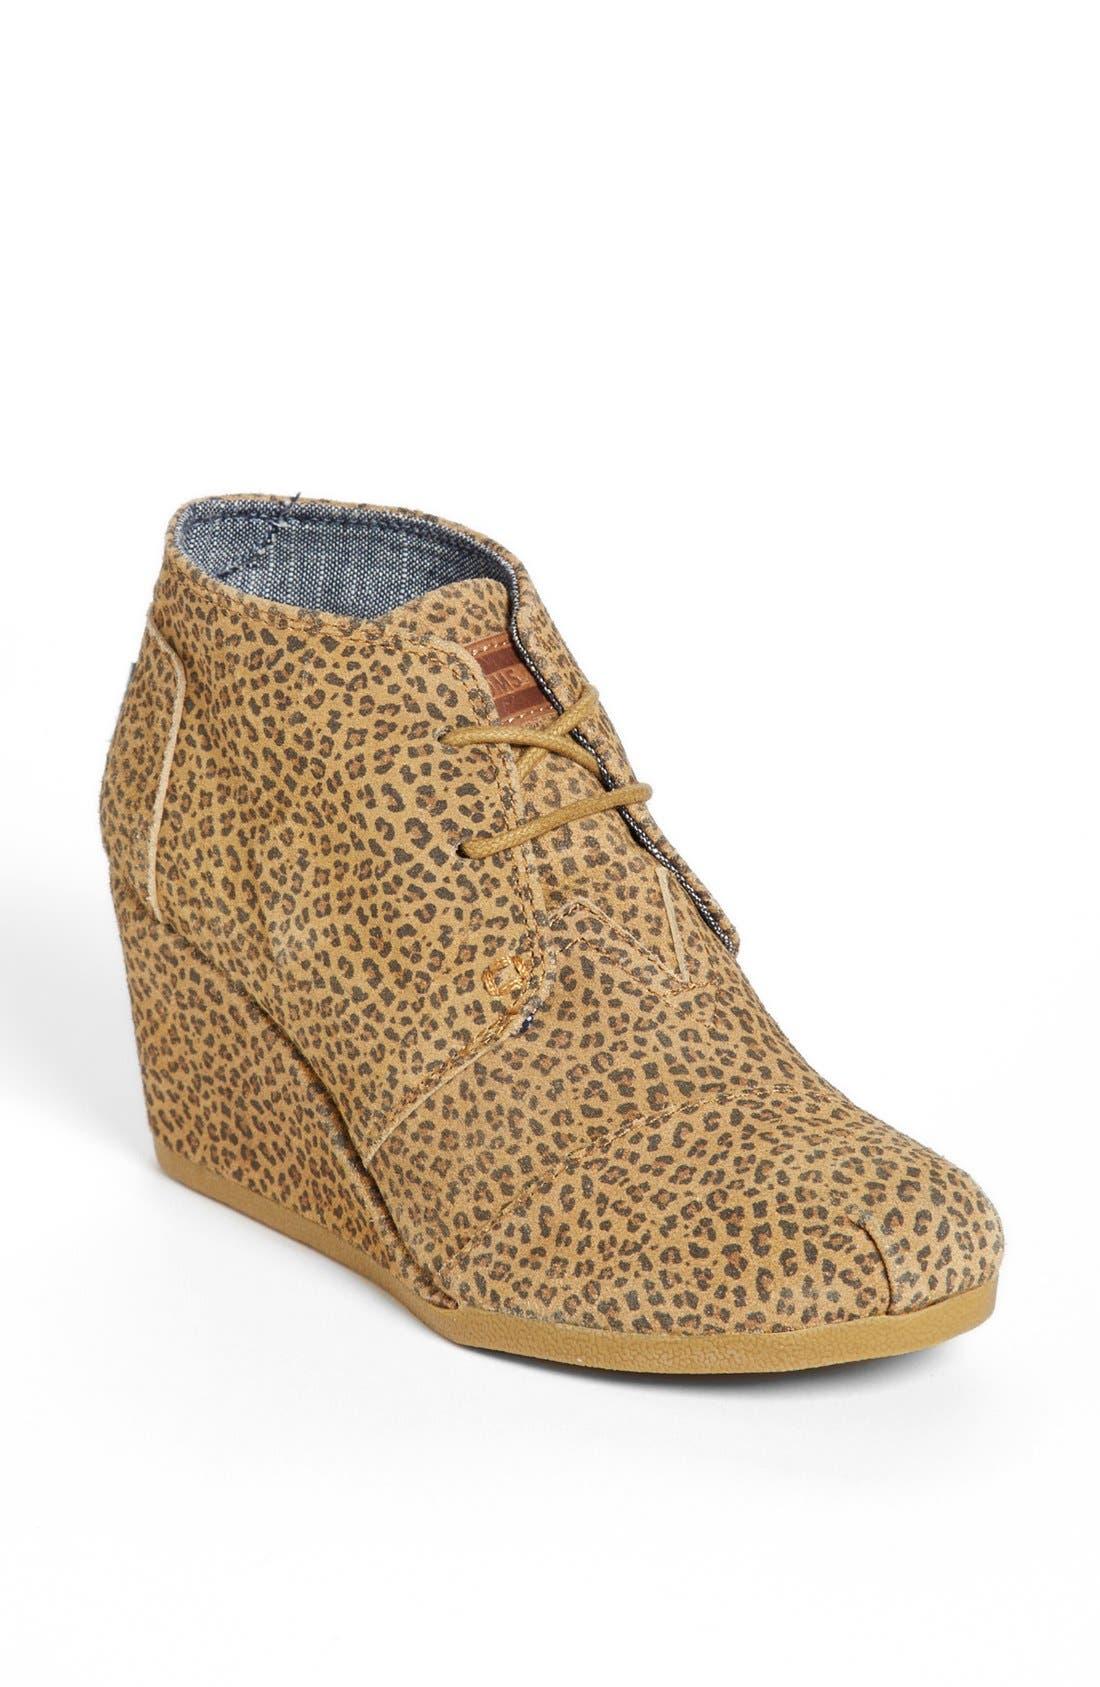 Main Image - TOMS 'Desert - Cheetah' Suede Wedge Bootie